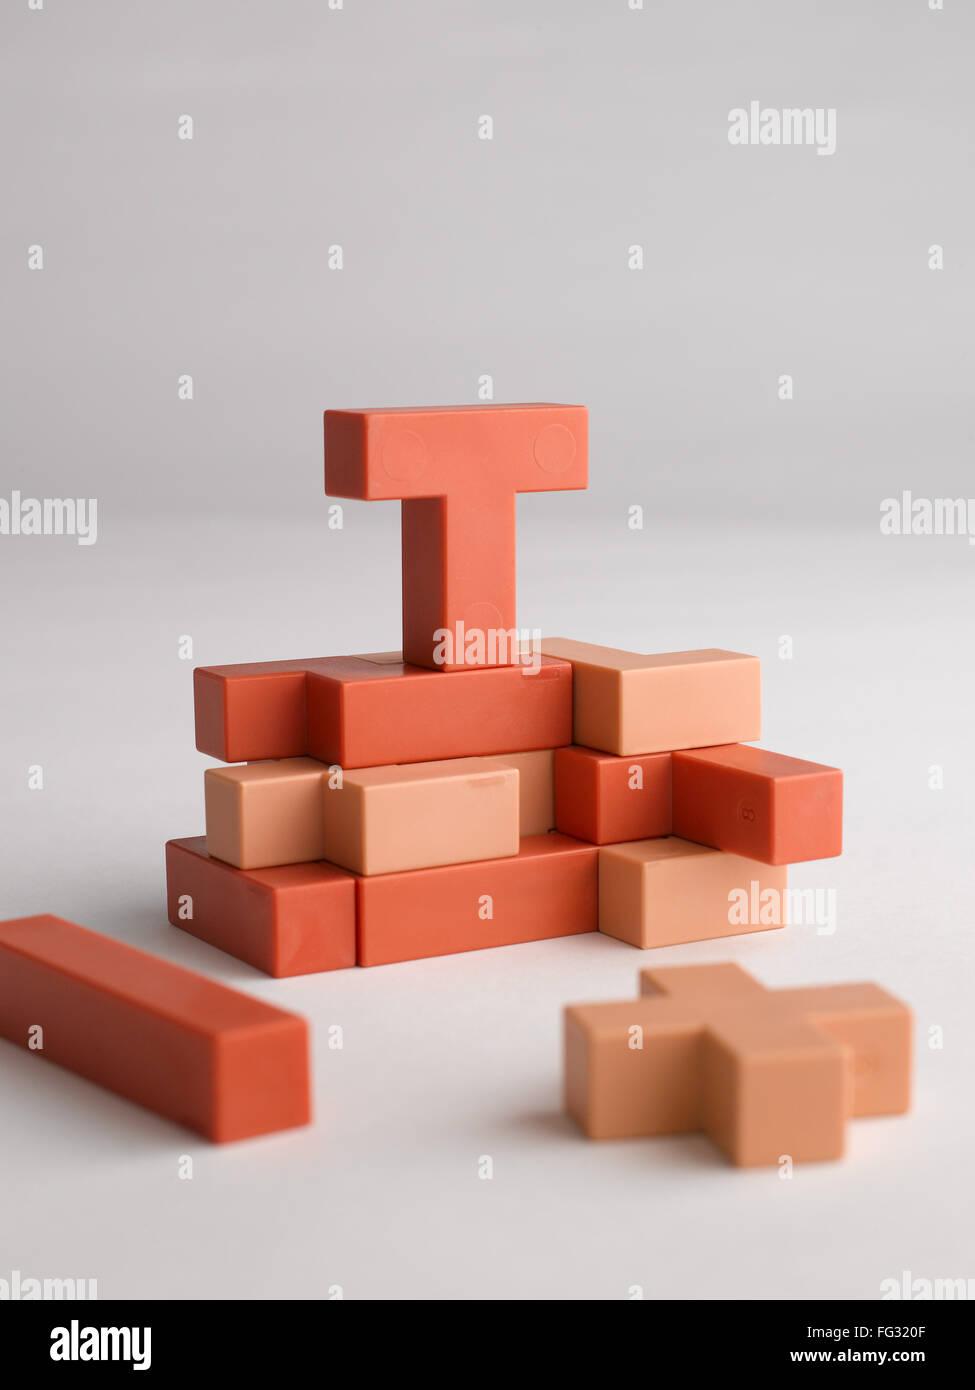 puzzle India - Stock Image